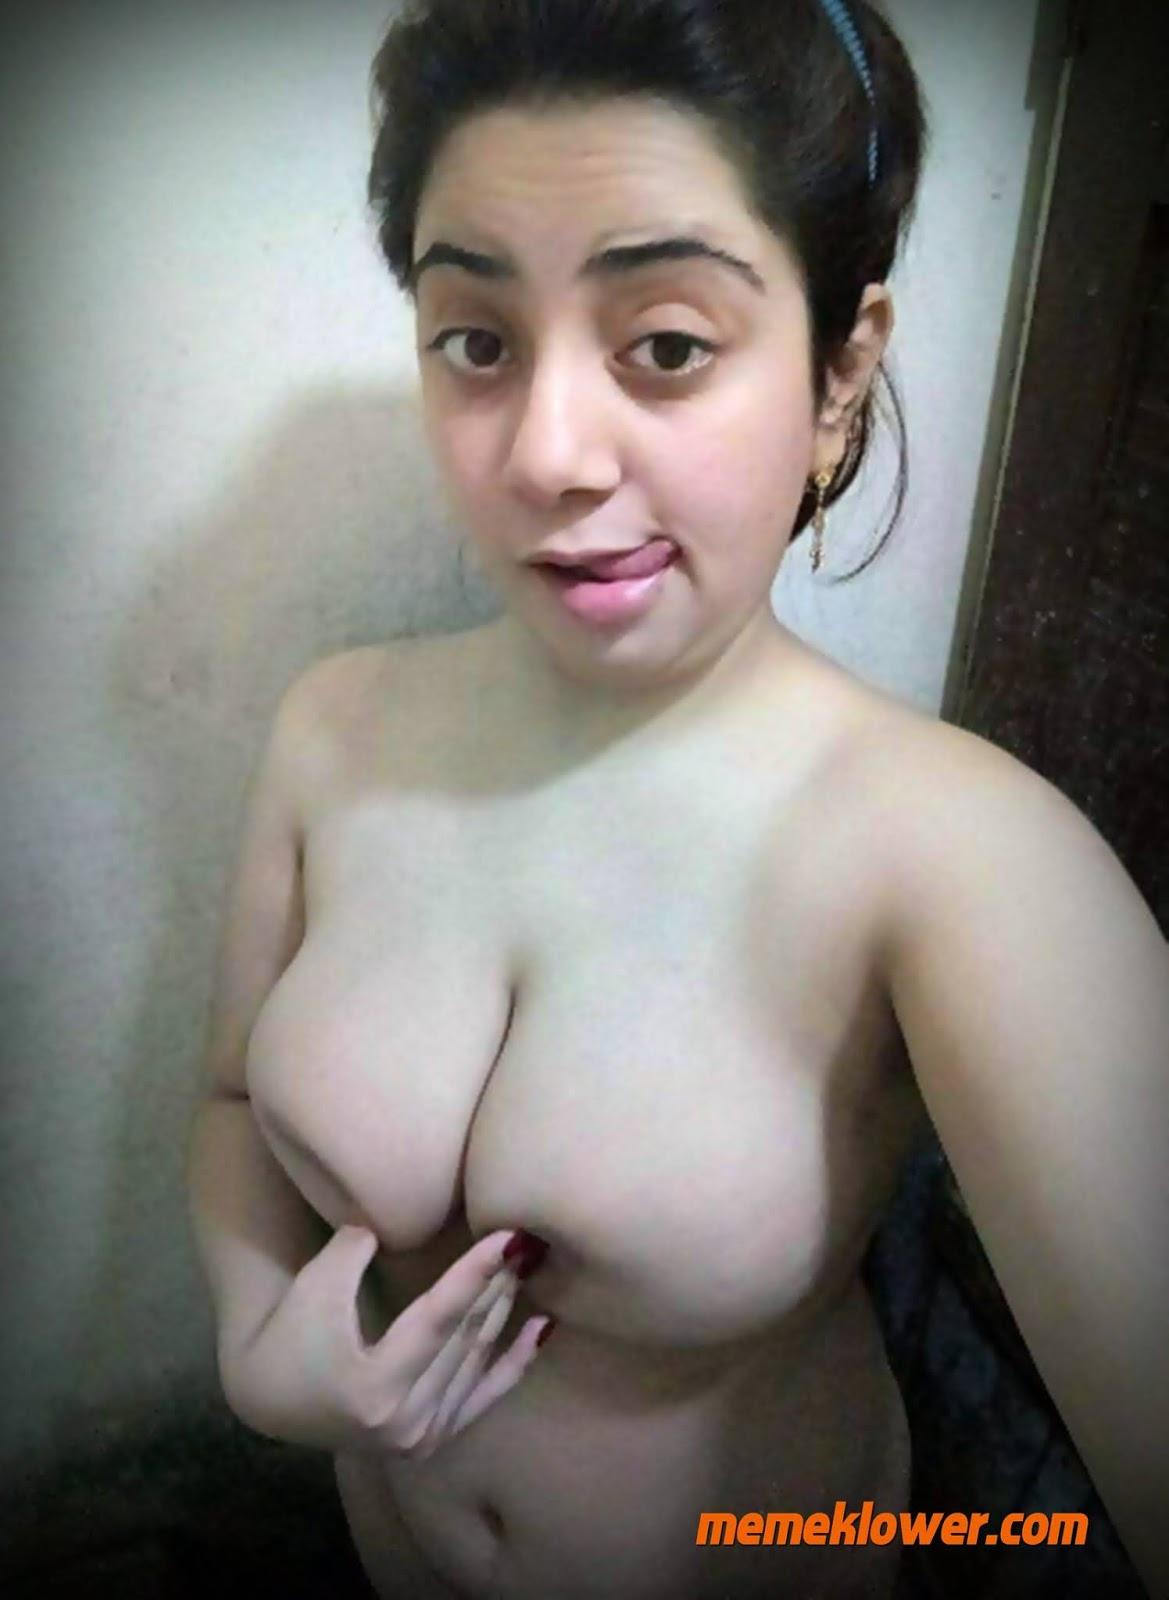 foto-bugil-tante-cantik-toge-body-mulus-2